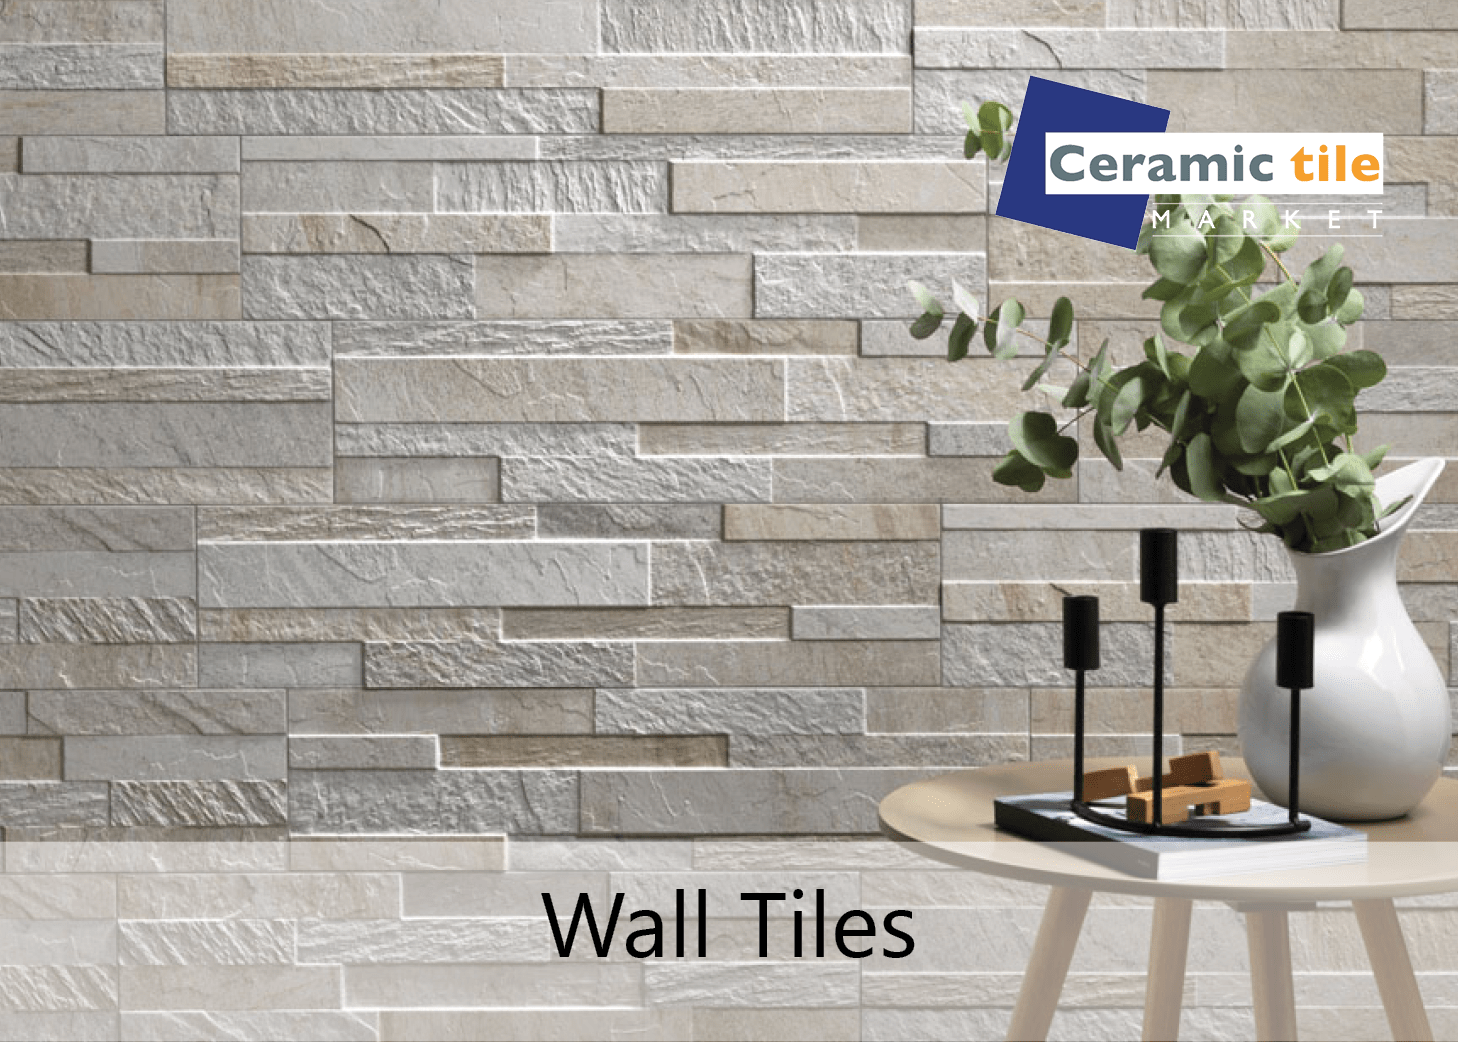 ceramic tile market emc tiles wall tiles 3d textured cubics